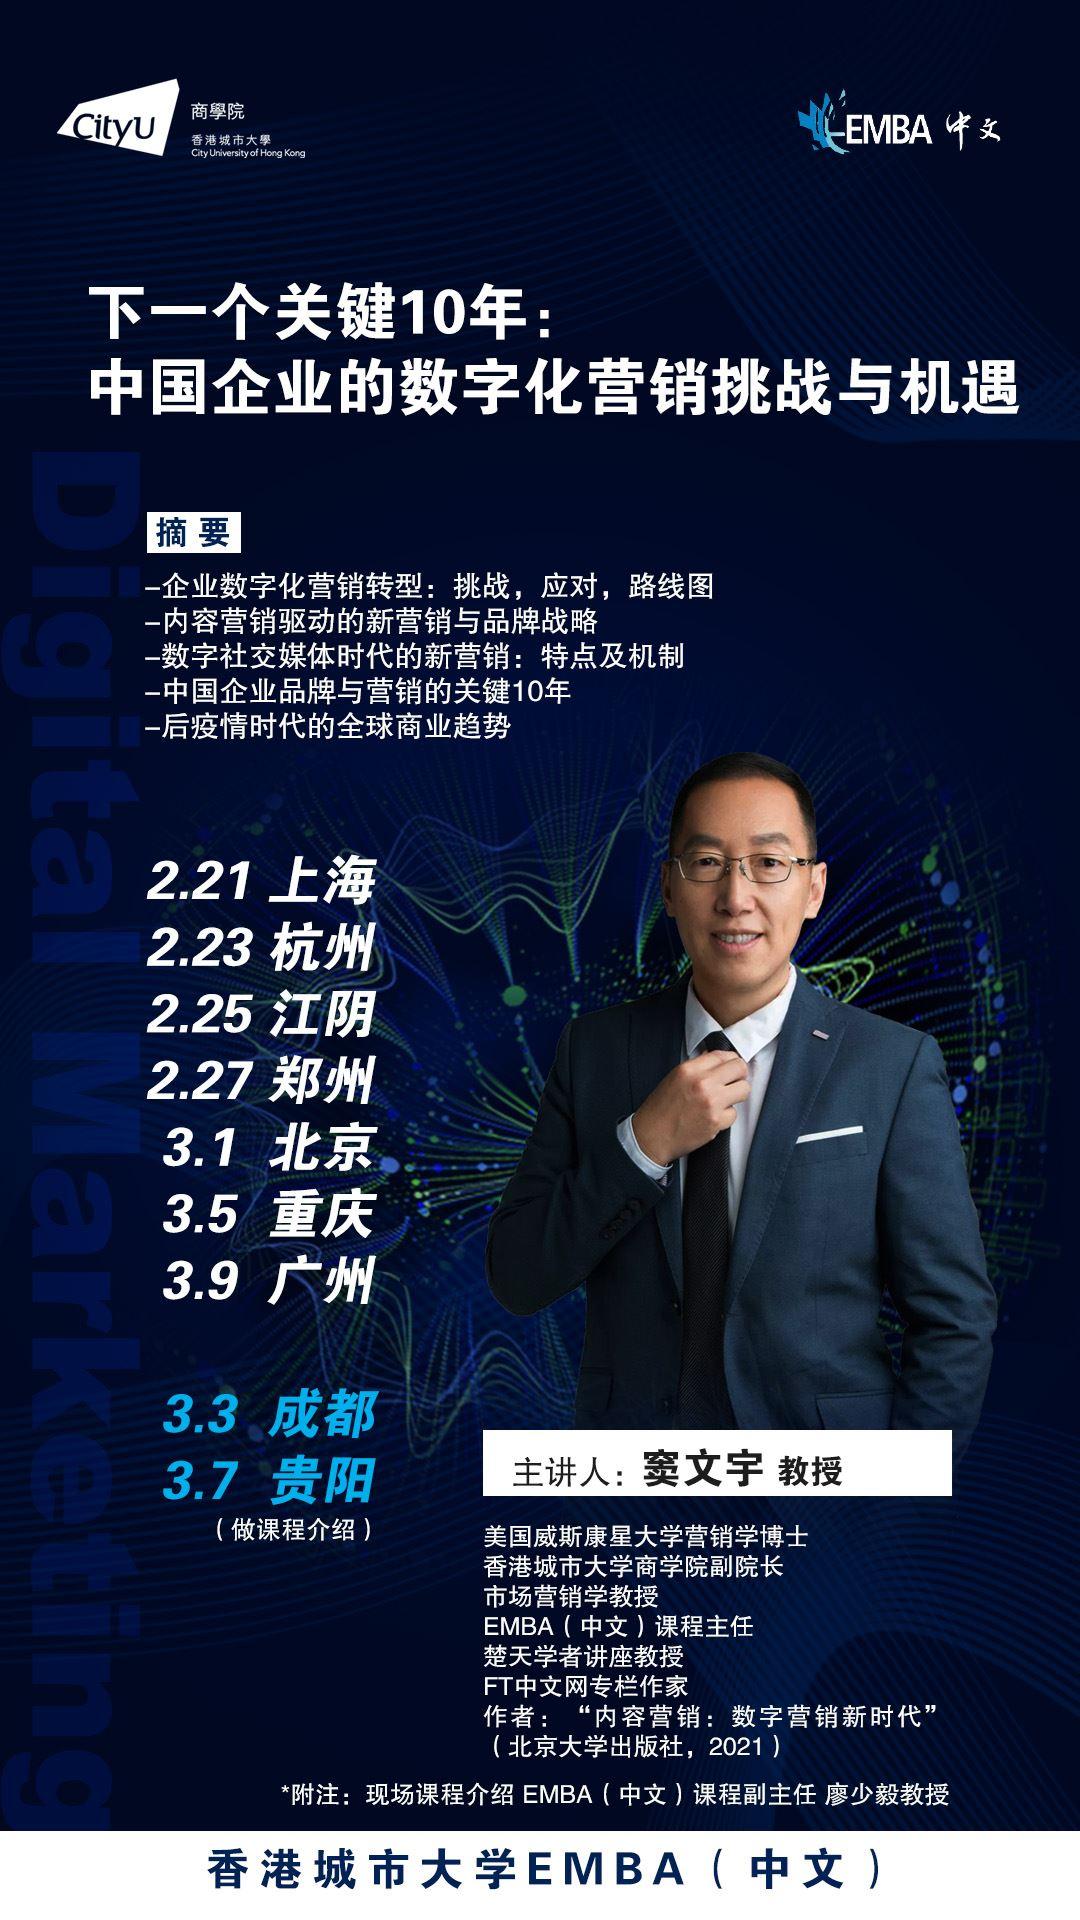 http://www.huodongxing.com/file/20160831/6182434467981/624067438055170.jpg